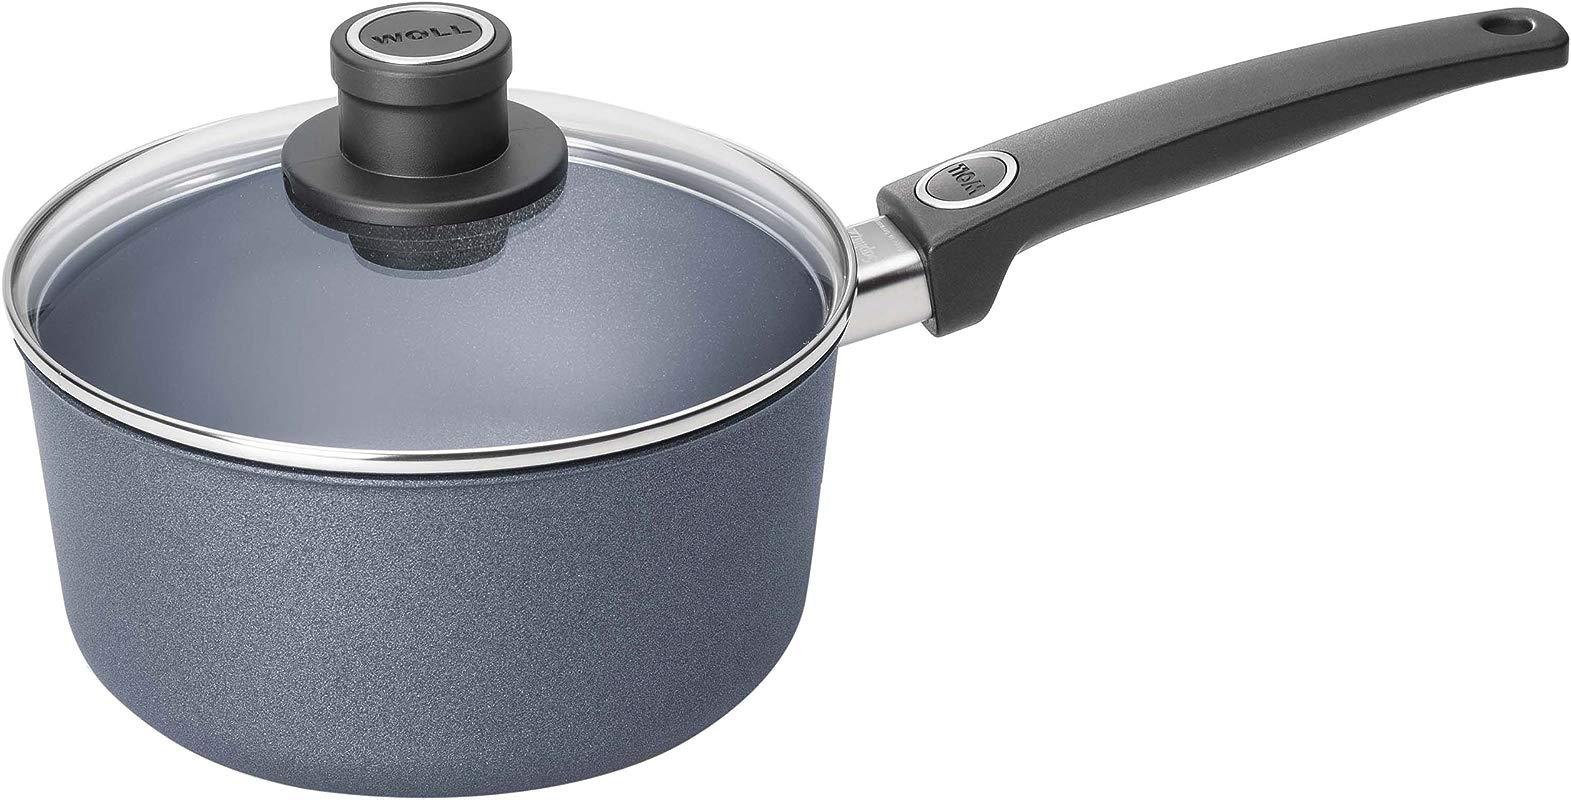 Woll W920DPSL Plus Diamond Lite Sauce Pan 3 Quart Saucepan With Lid